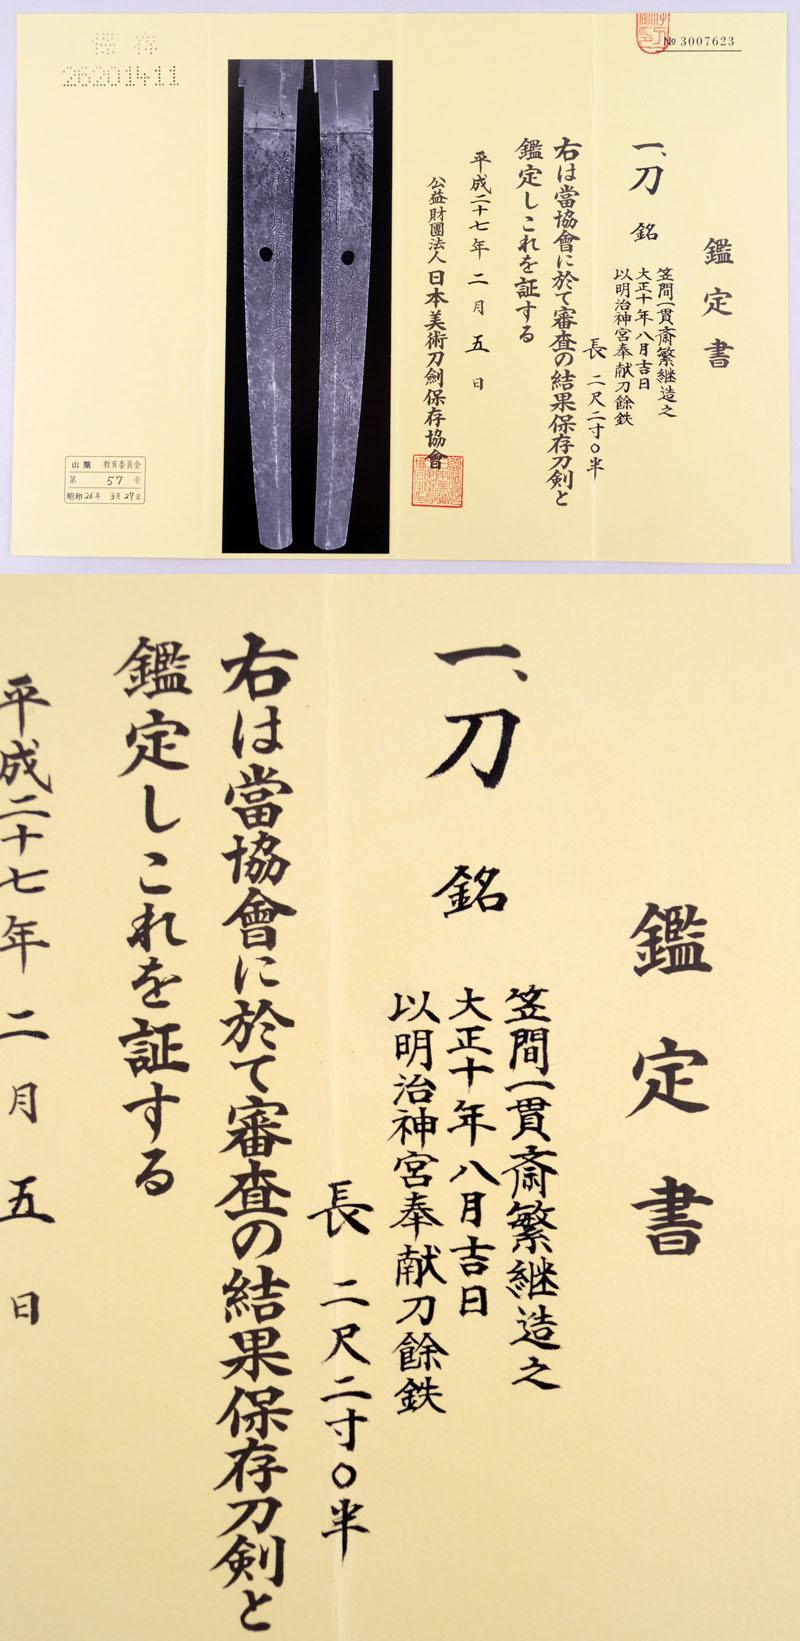 笠間1貫斎繁継造之 Picture of Certificate